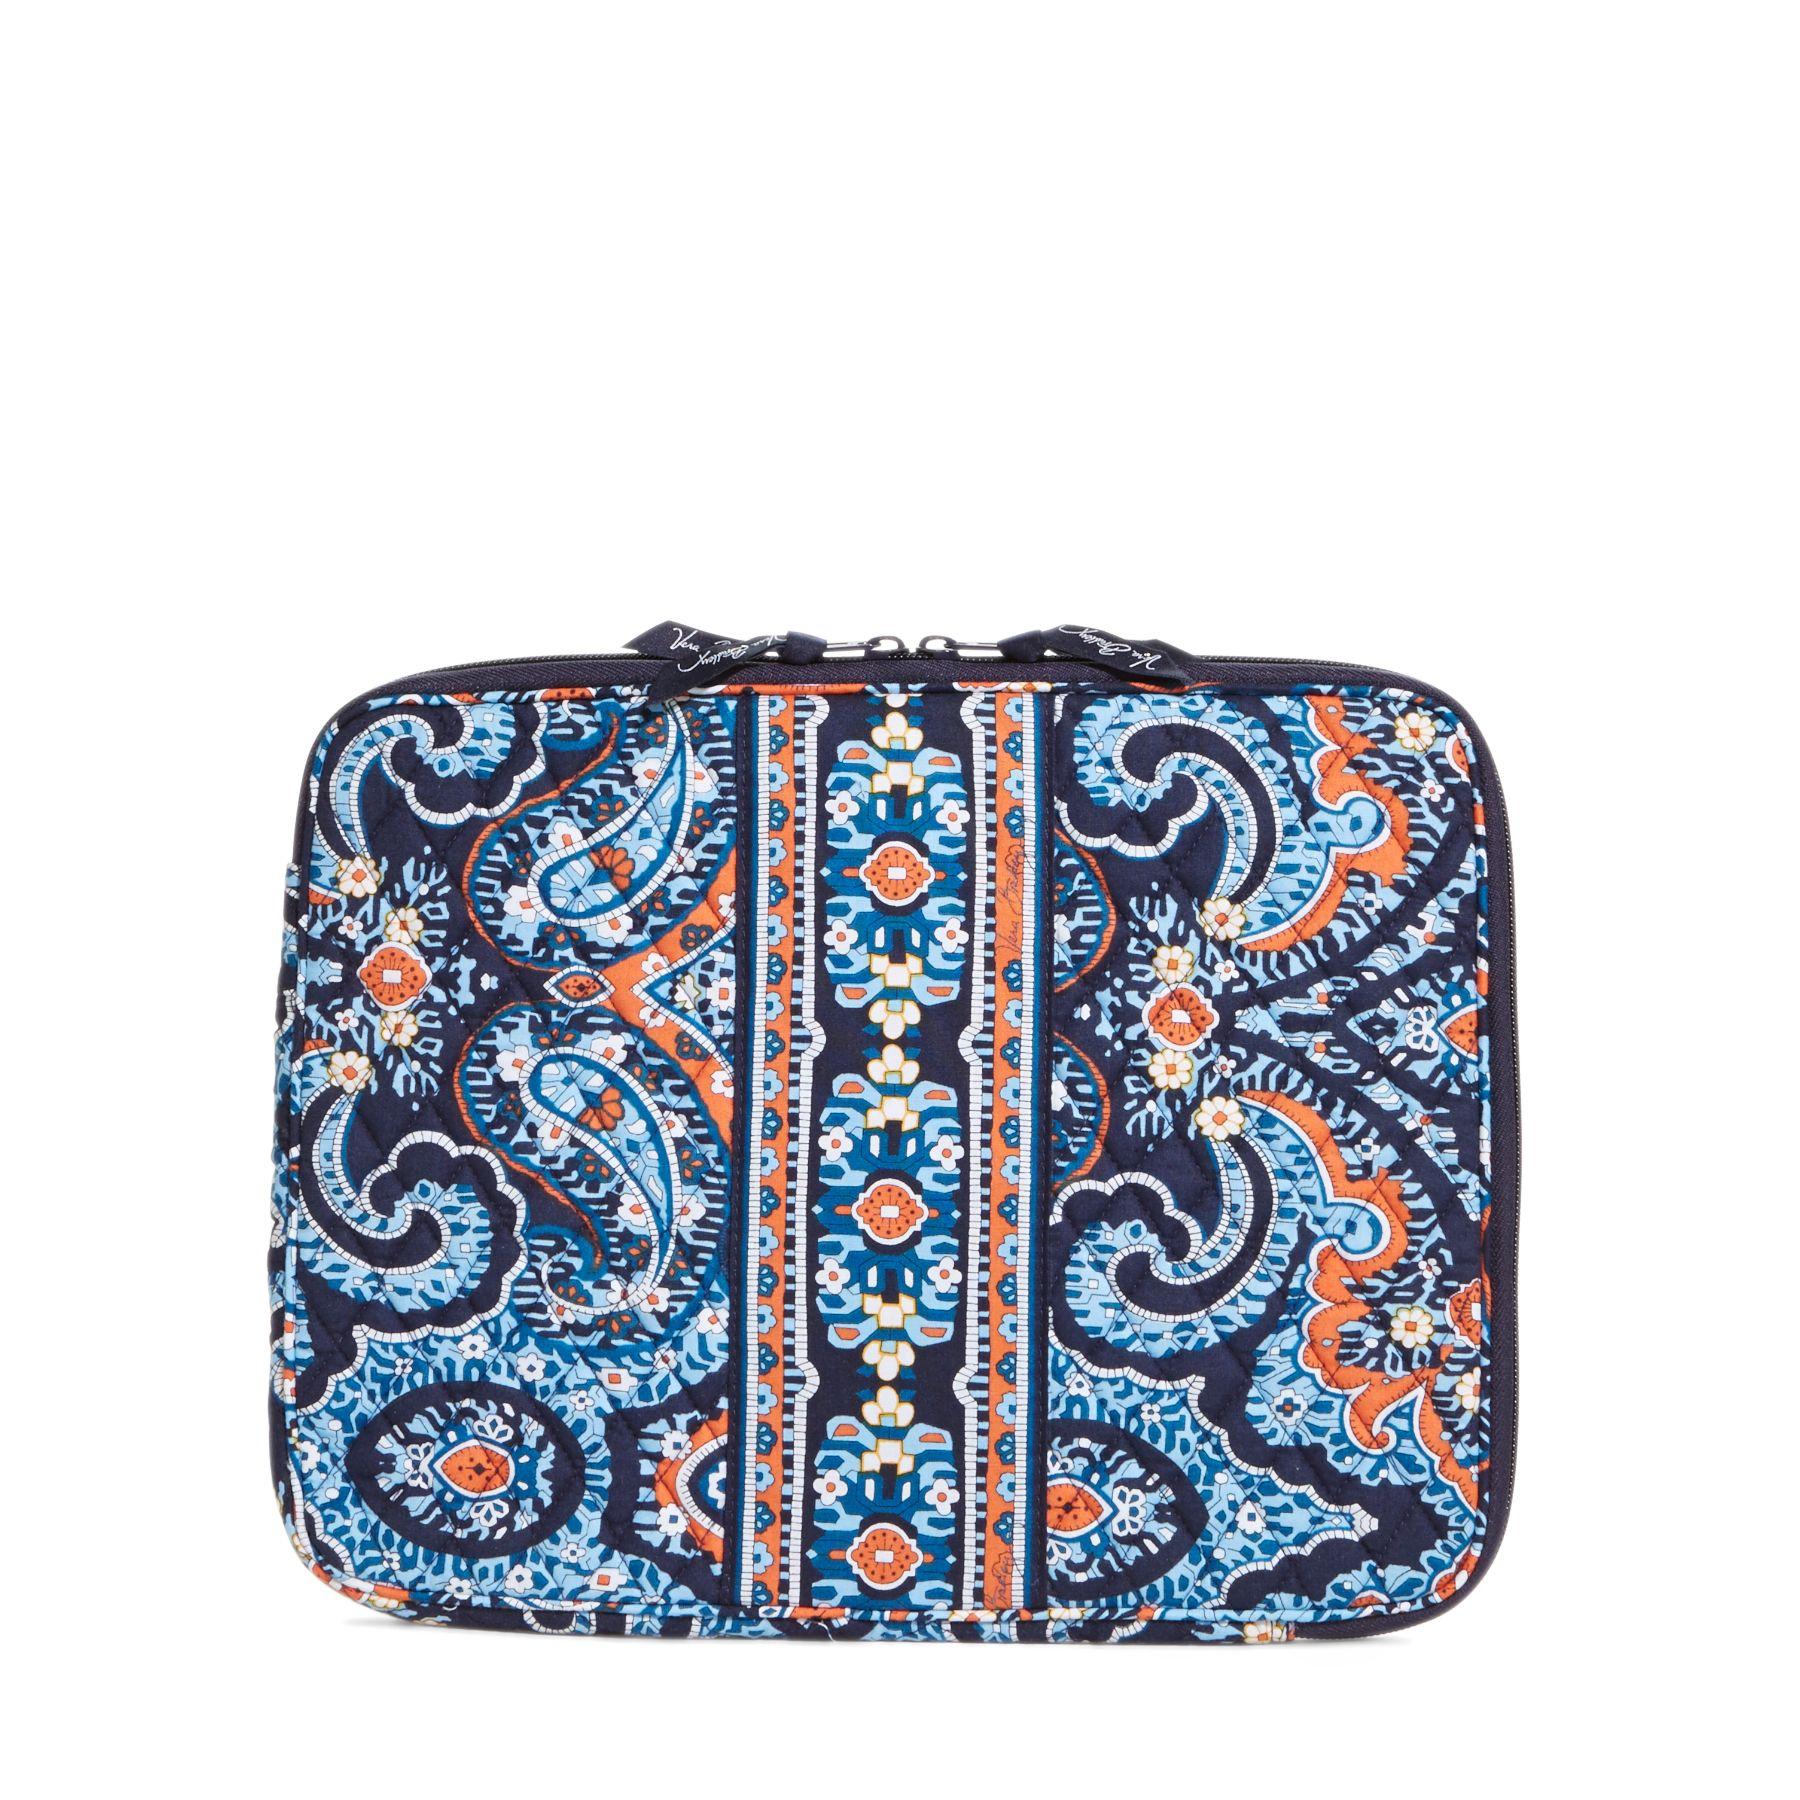 Upc 886003296776 Product Image For Vera Bradley Women S Laptop Sleeve Marrakesh Upcitemdb